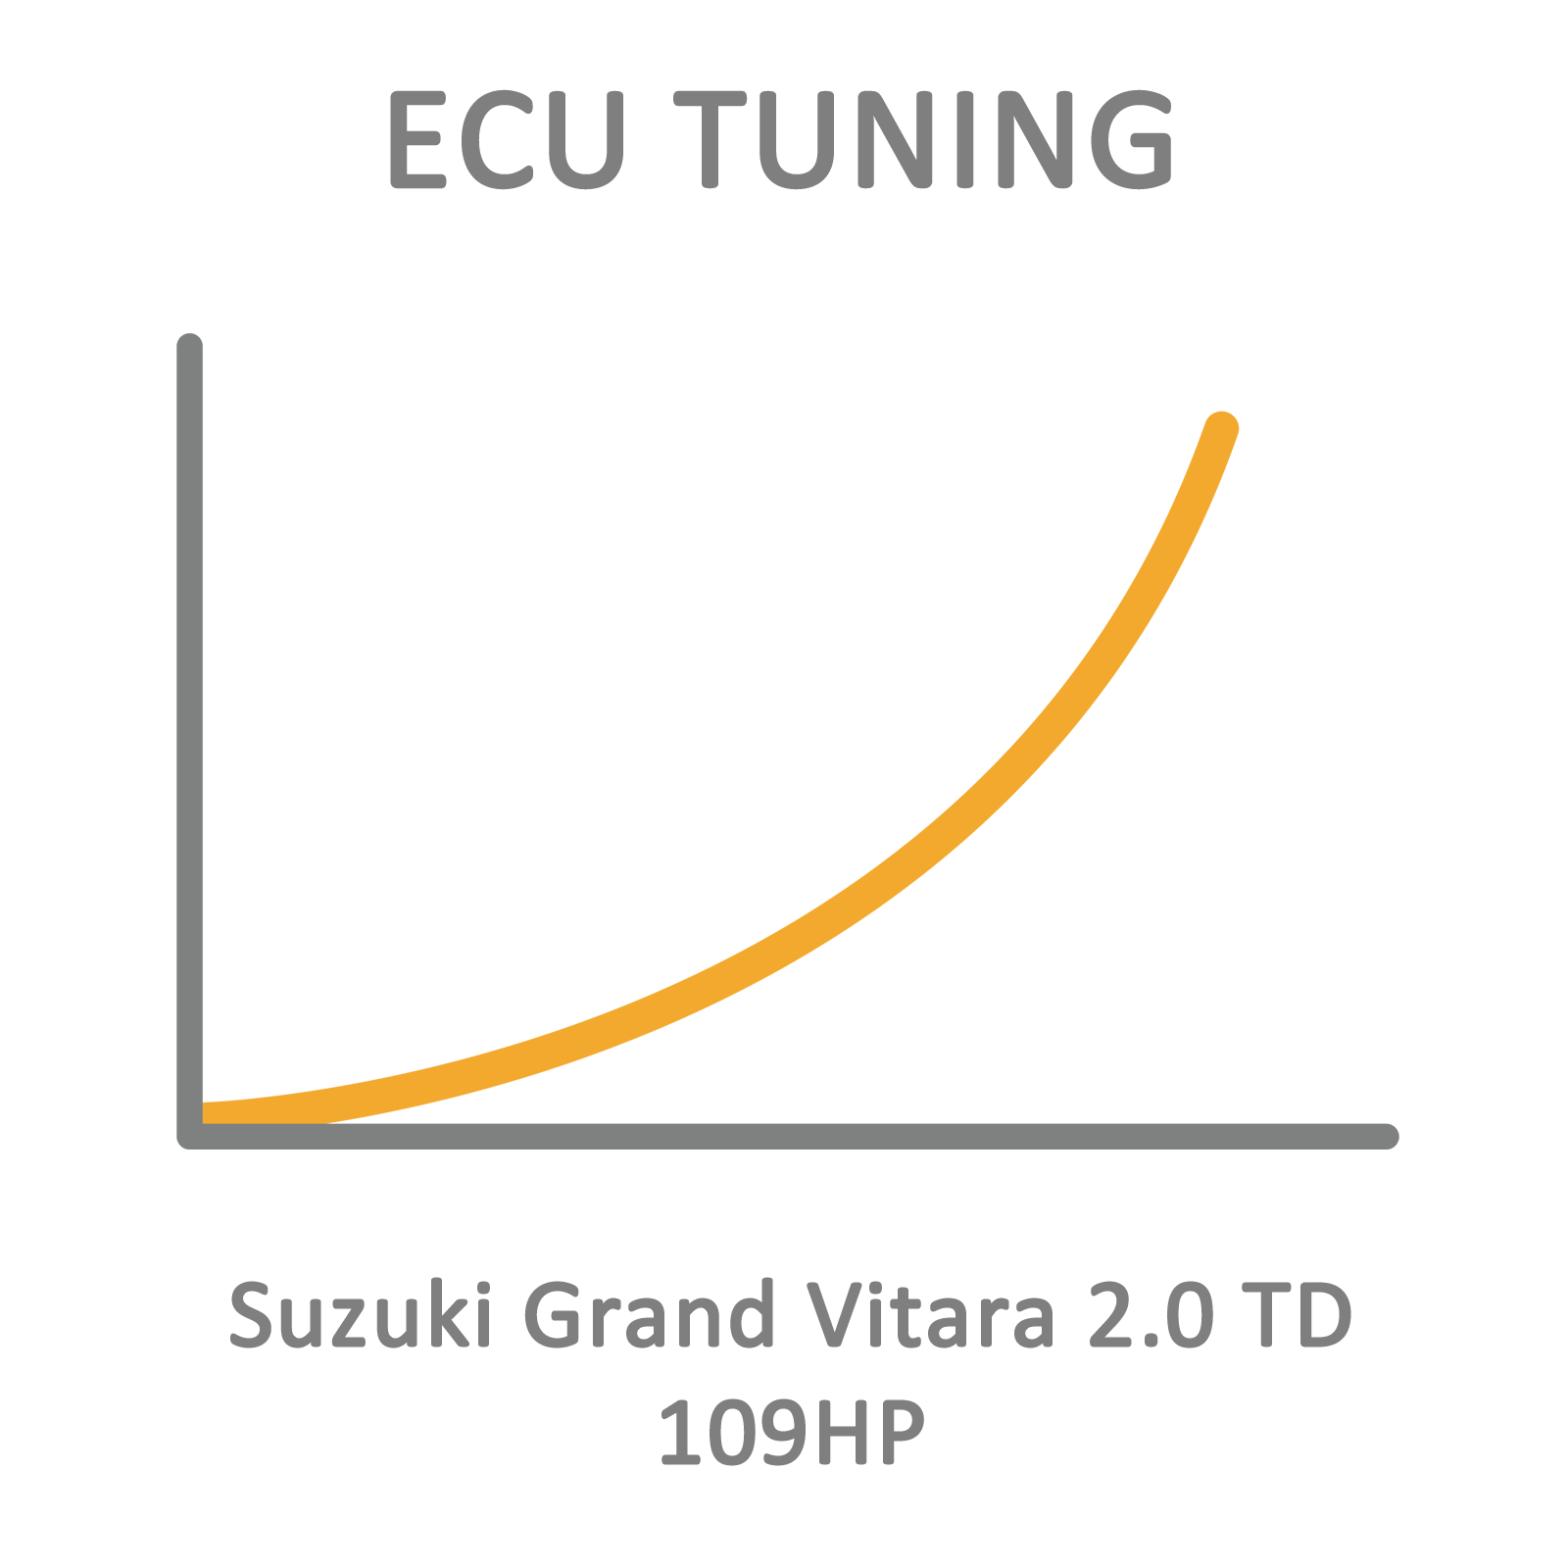 Suzuki Grand Vitara 2.0 TD 109HP ECU Tuning Remapping